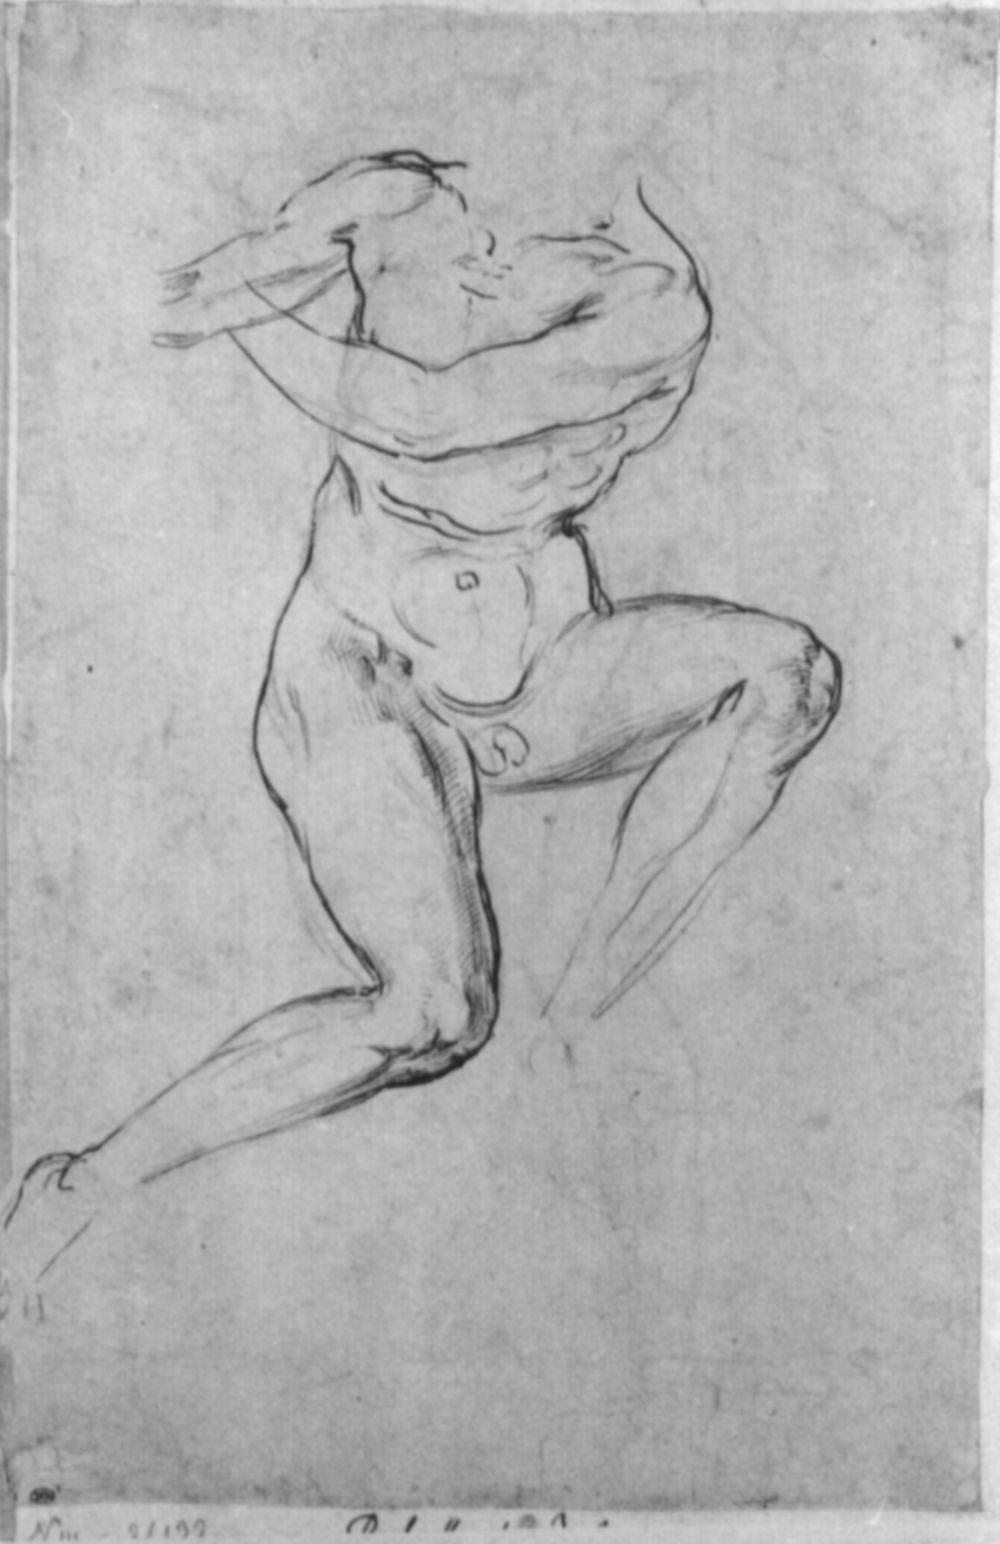 Raphael Sanzio. Study of a Nude for battle scenes